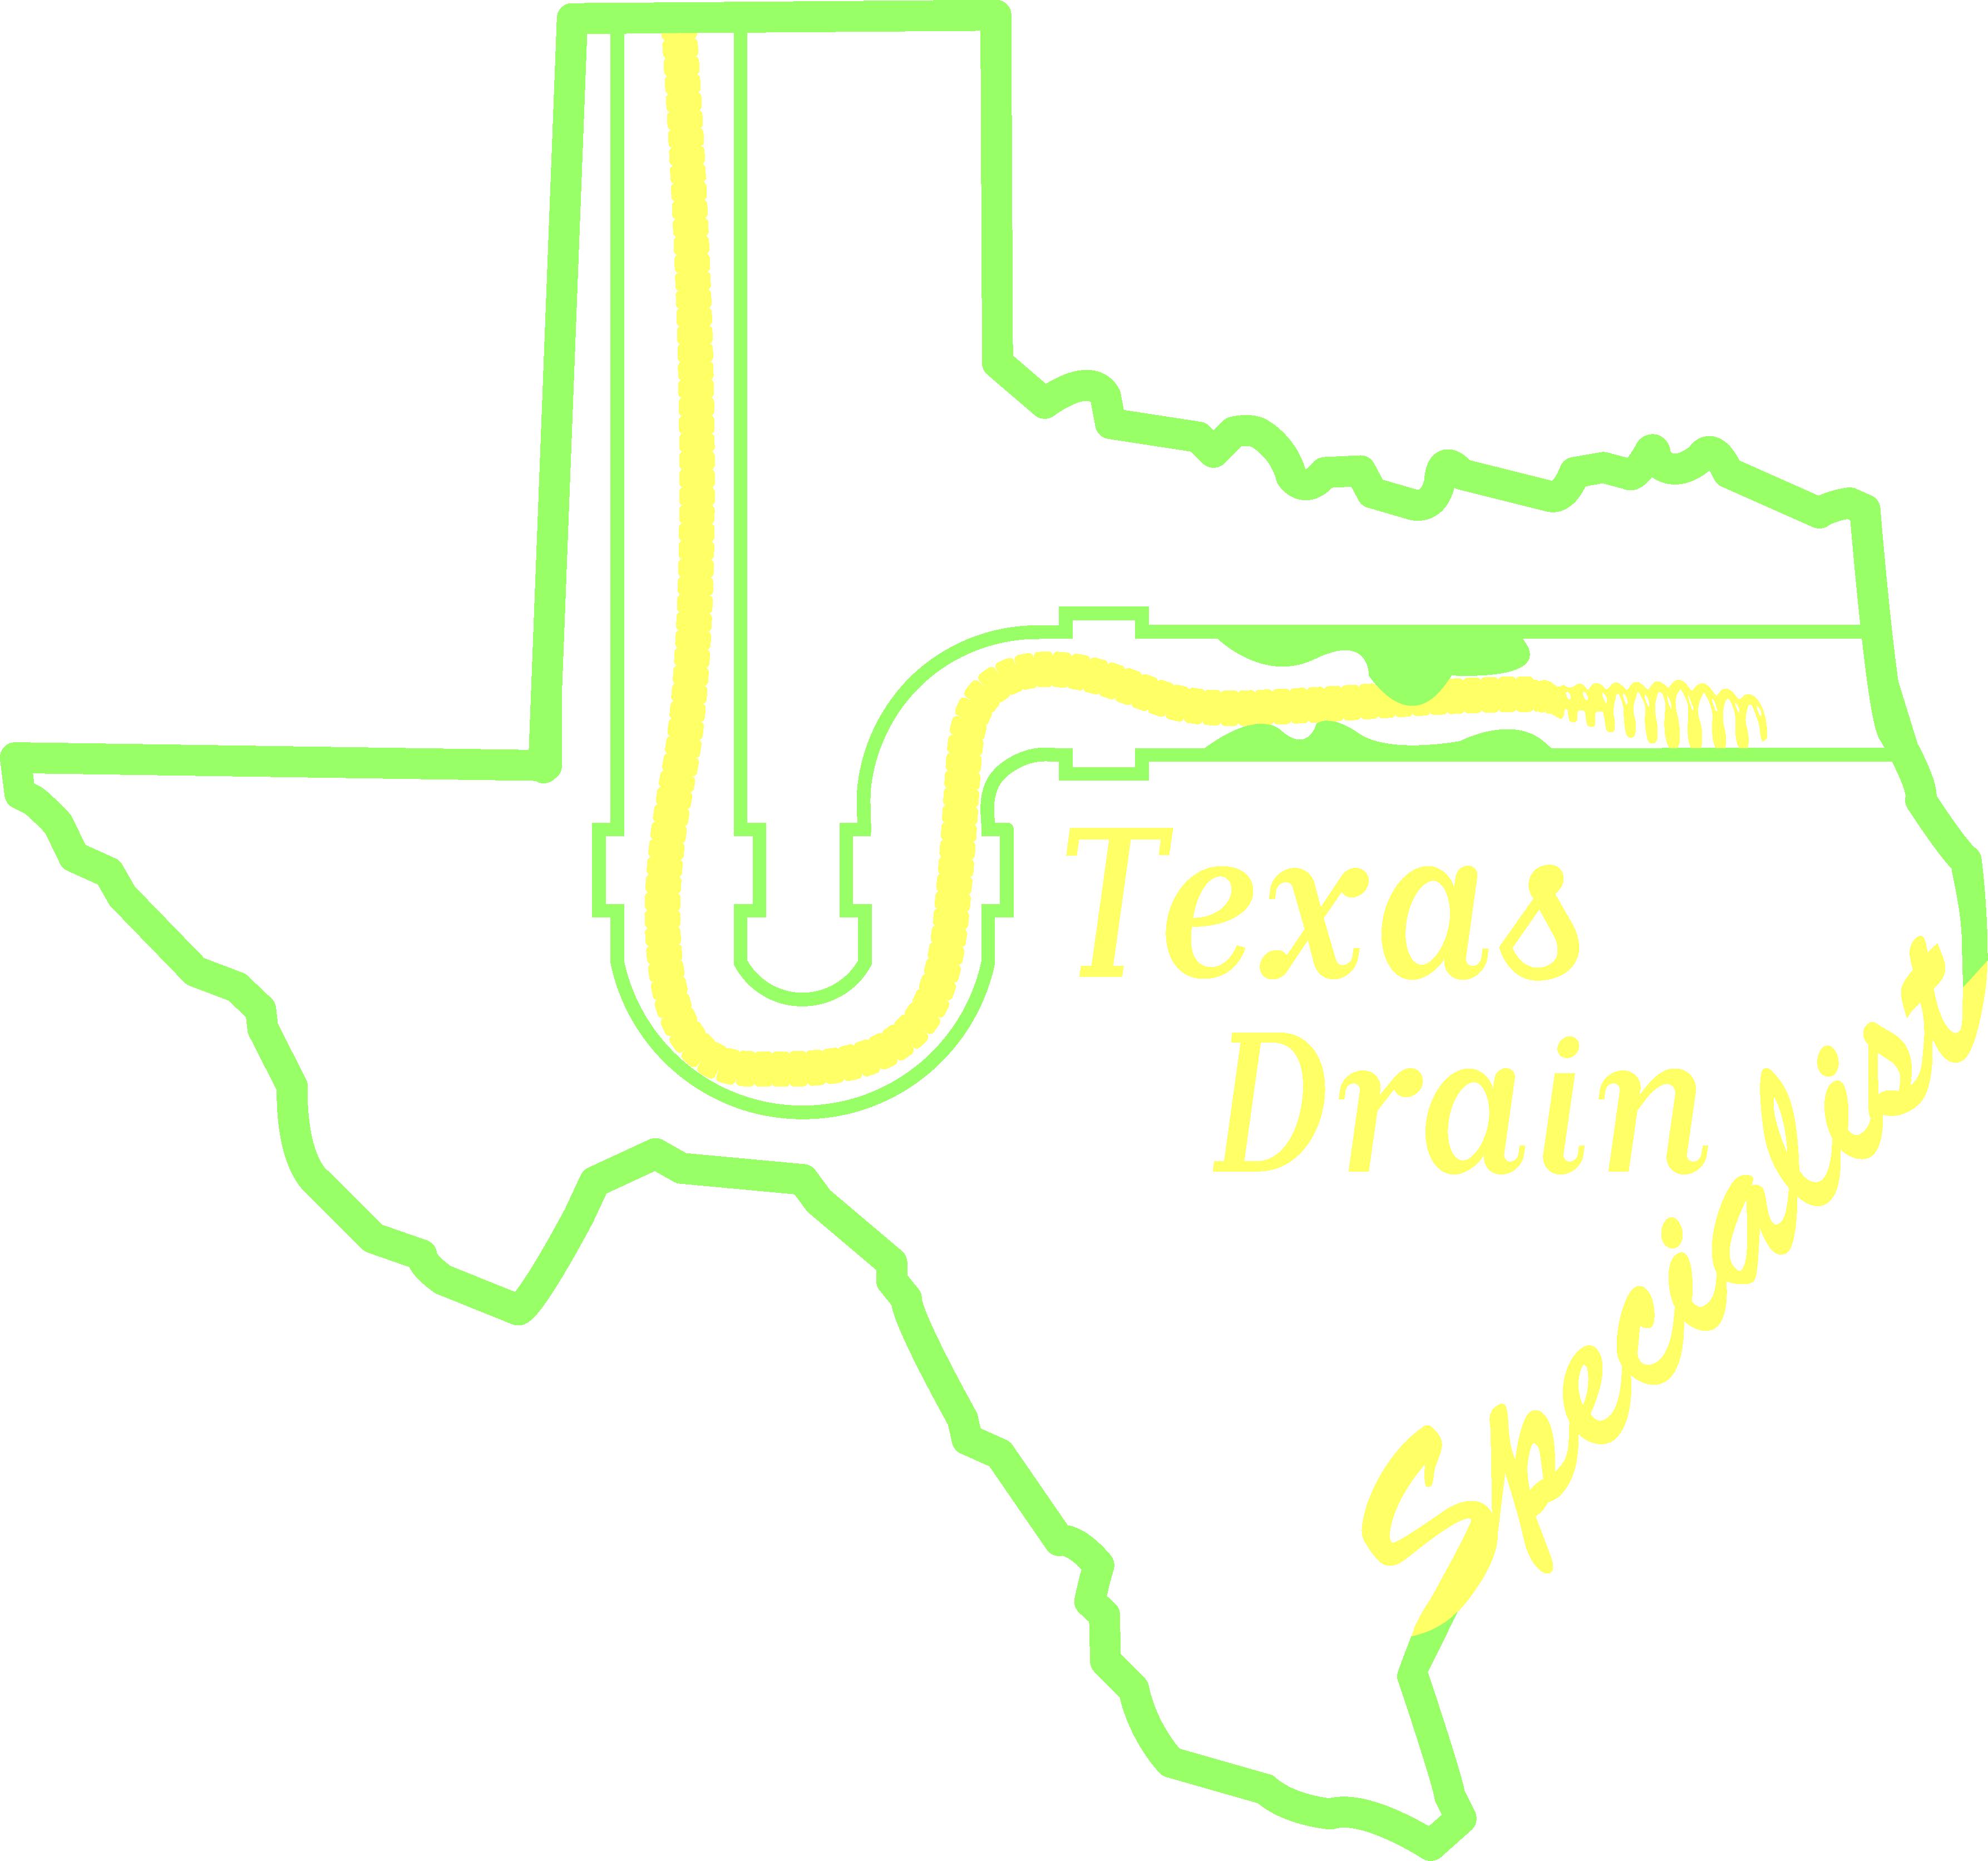 Texas Drain Specialist